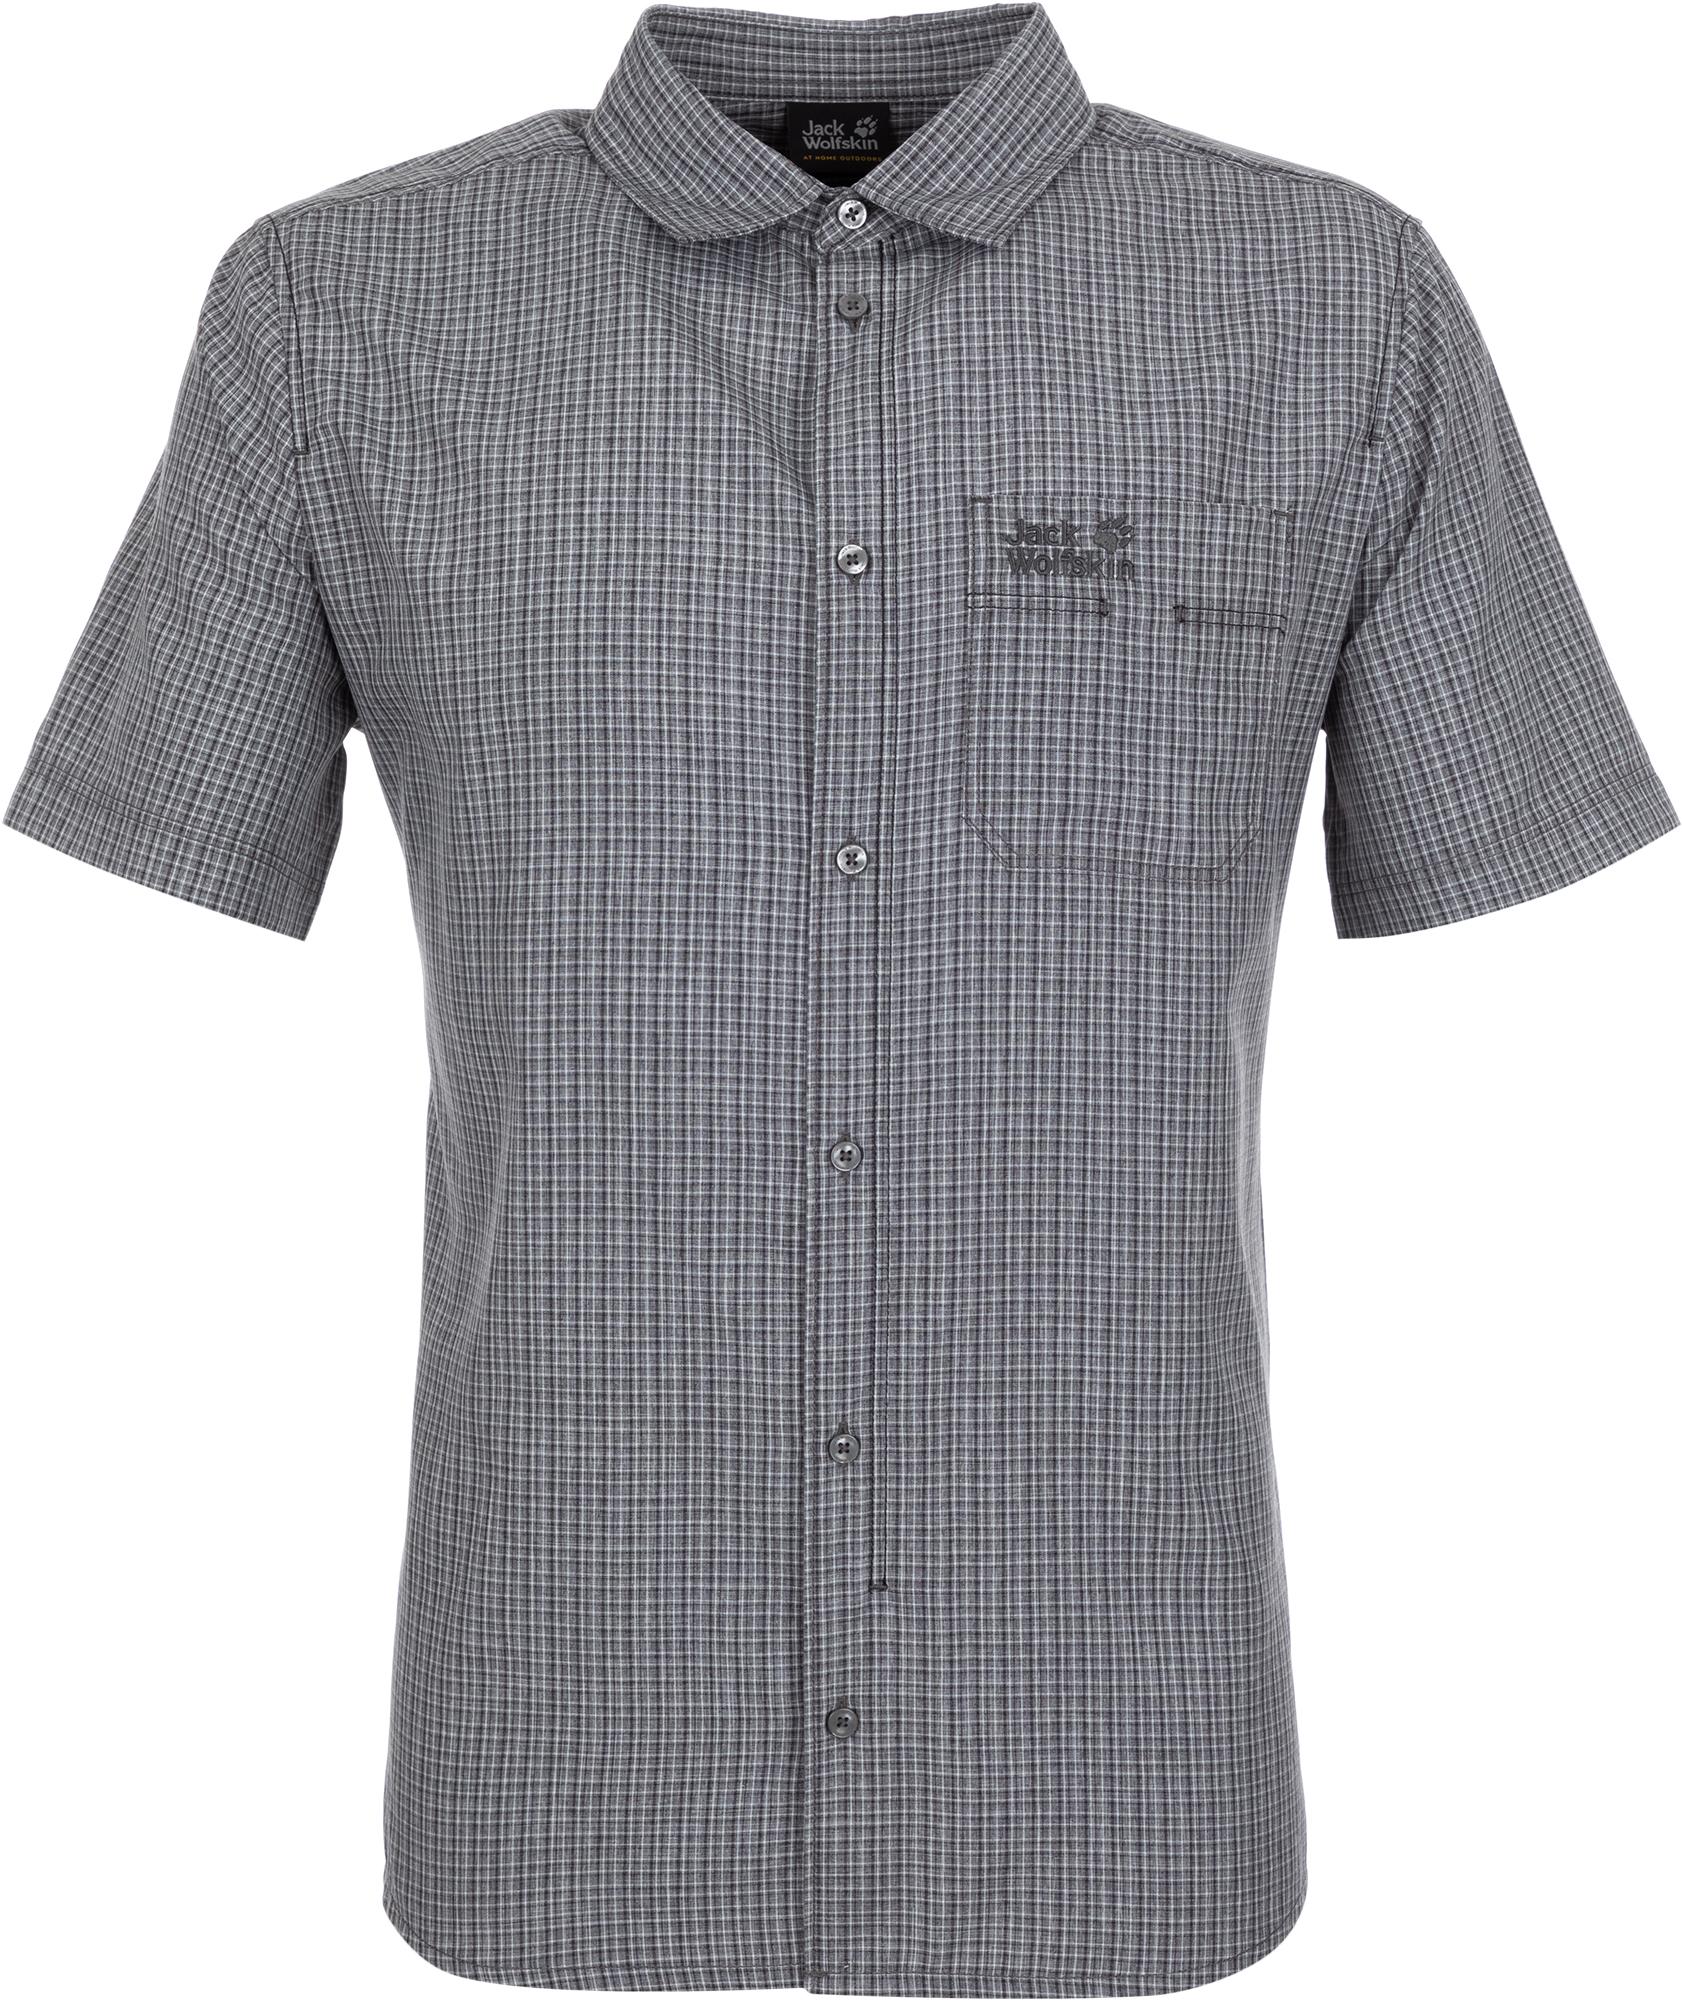 JACK WOLFSKIN Рубашка мужская JACK WOLFSKIN El Dorado, размер 58